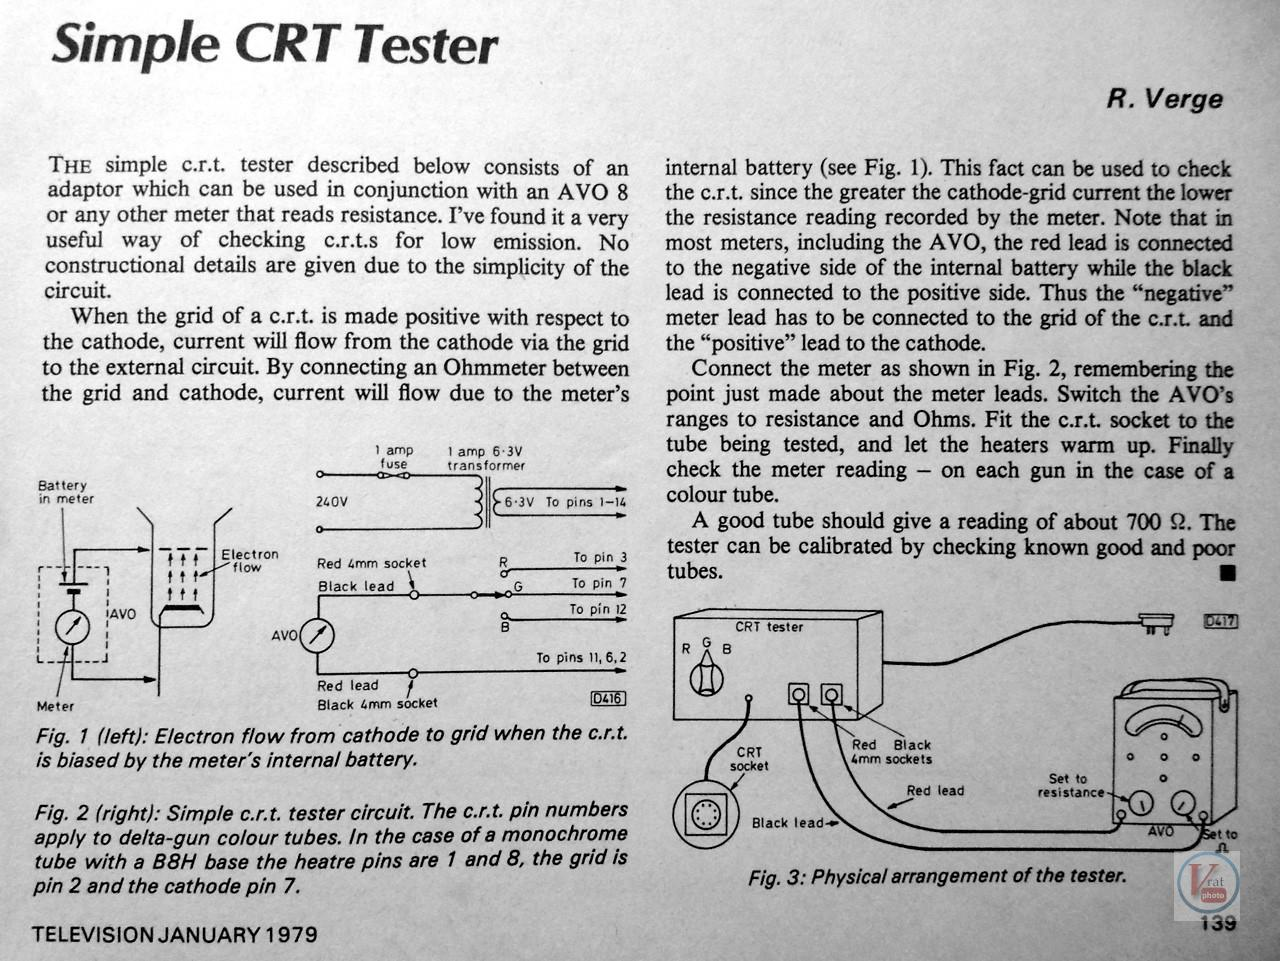 Build a Simple CRT Tester 1